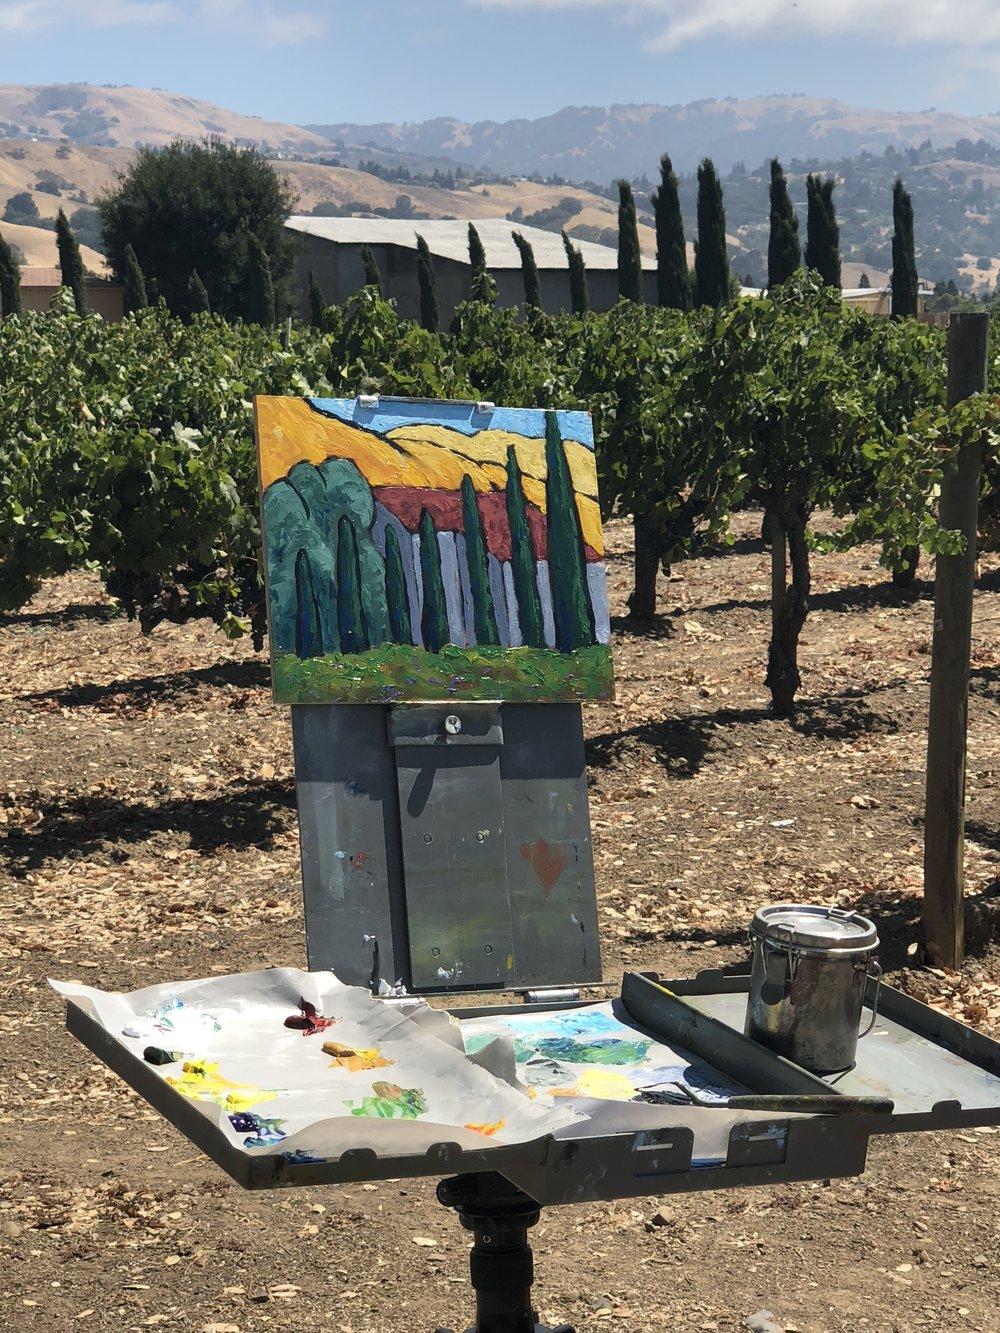 Work in progress at Guglielmo Winery